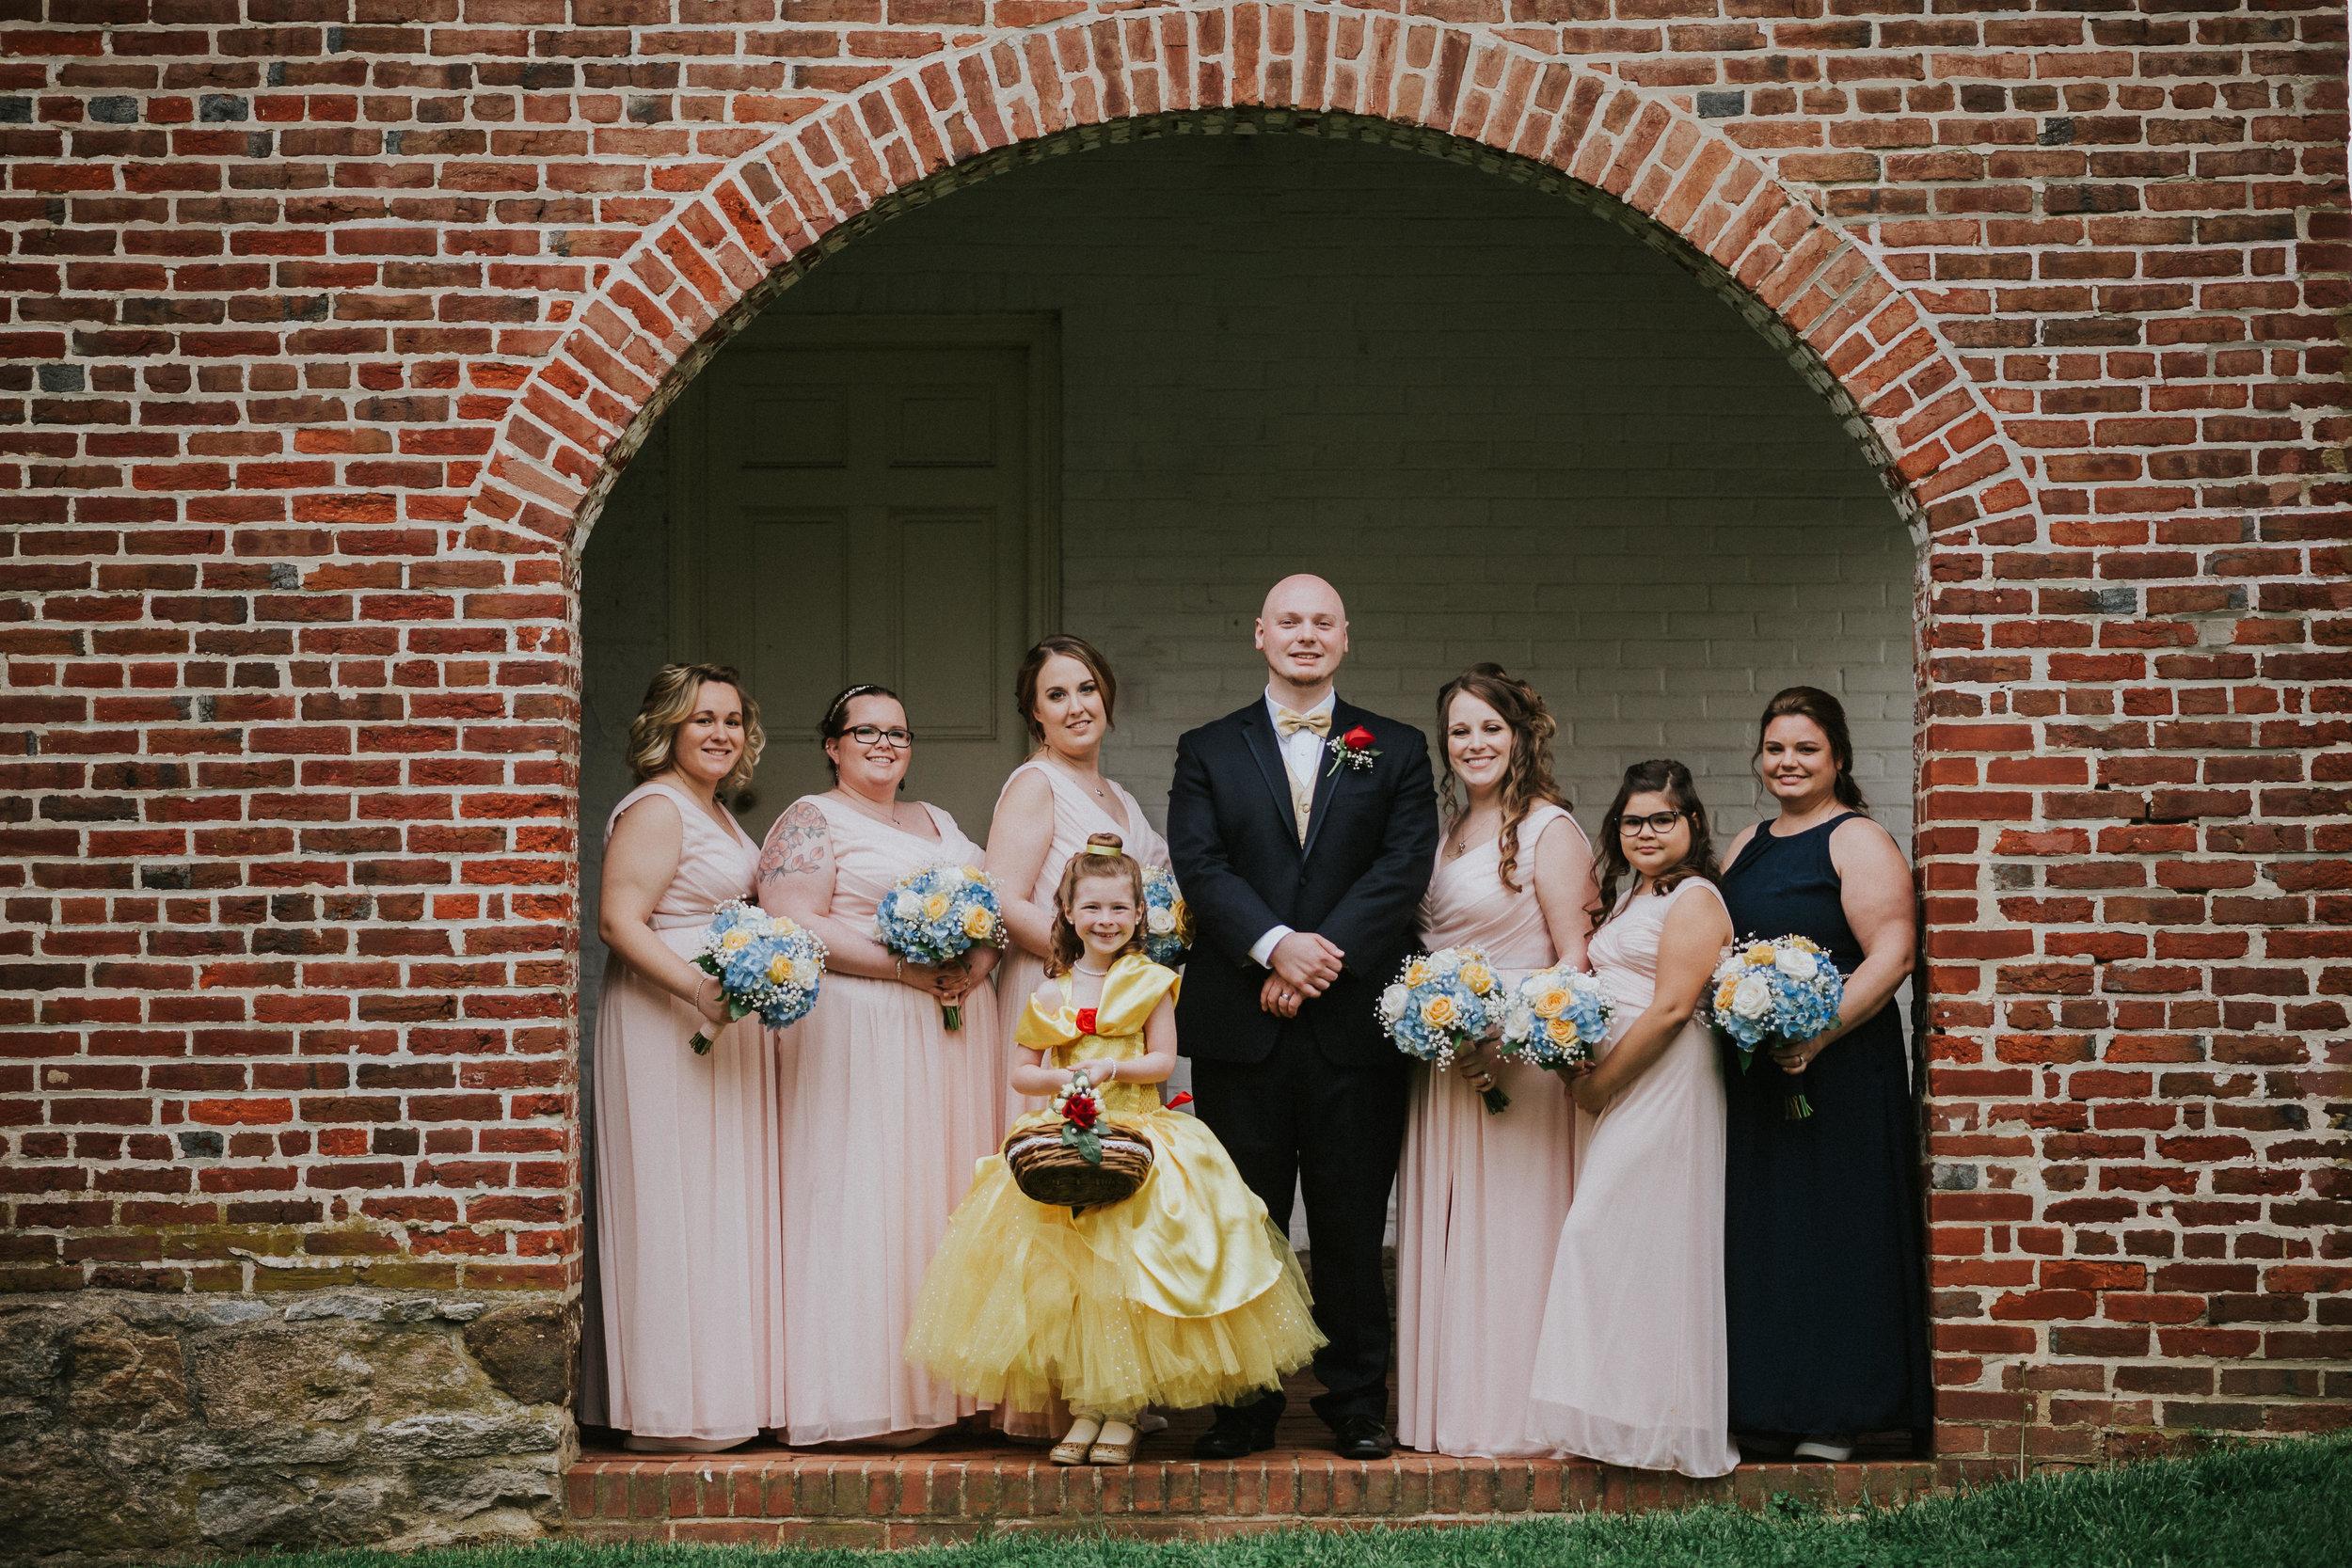 Barclay-Farmstead-Wedding-Rosa-and-Mike-438.jpg